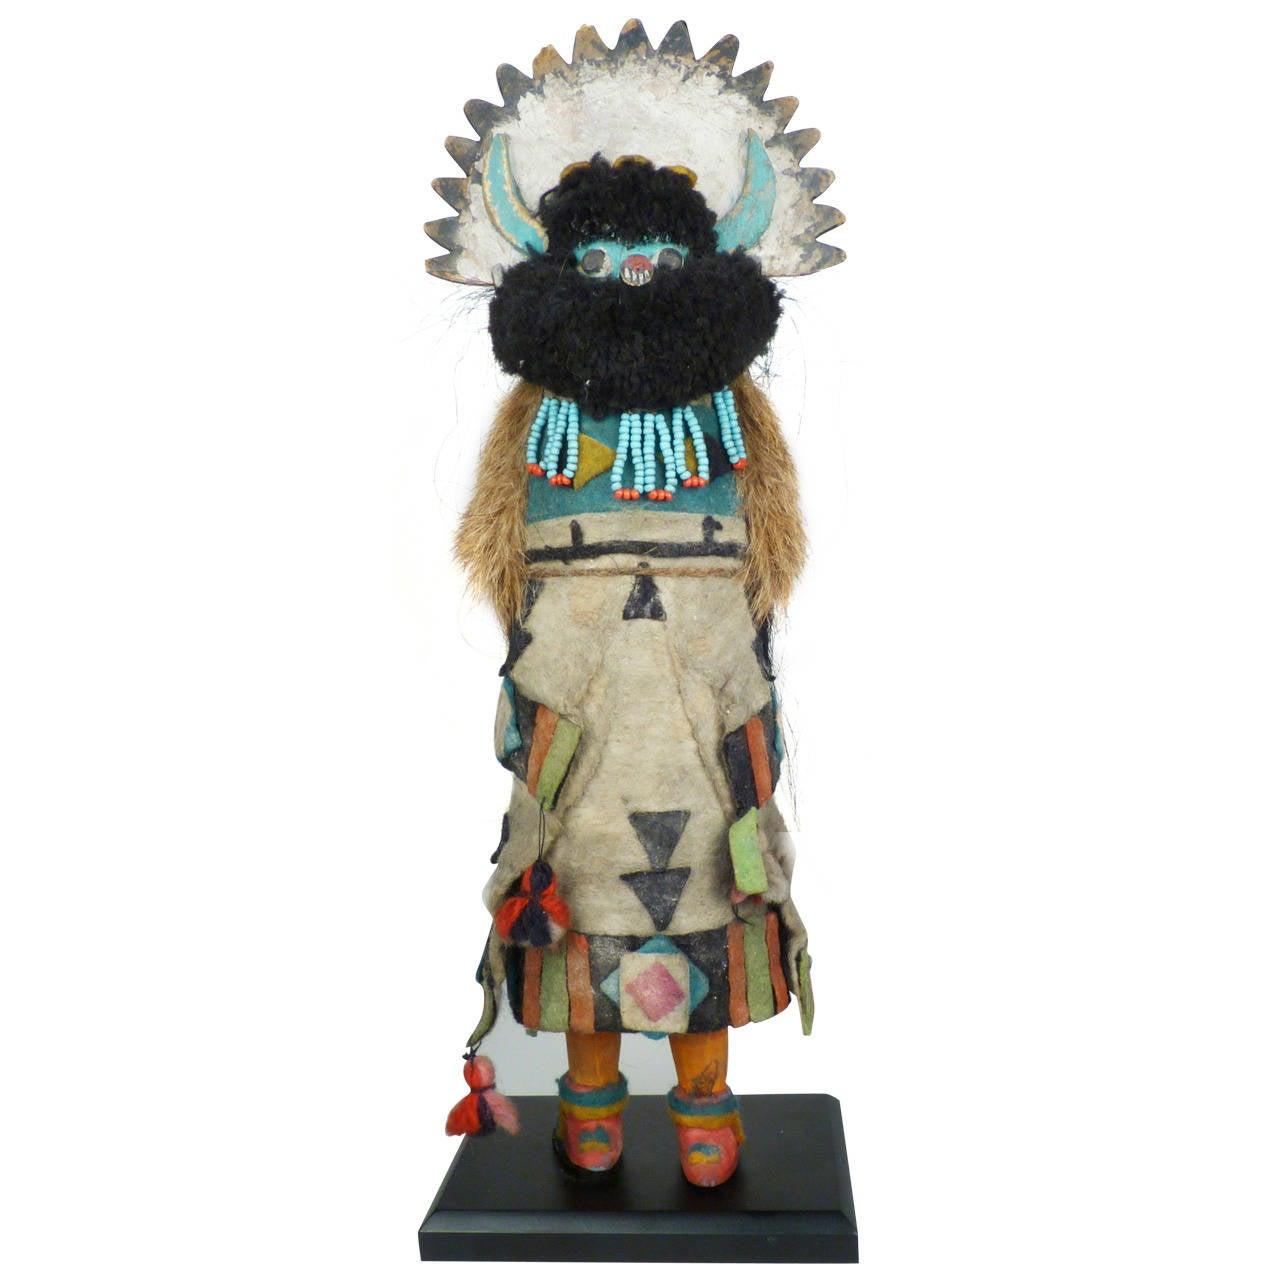 Vintage Zuni Kachina Doll Circa 1930s At 1stdibs